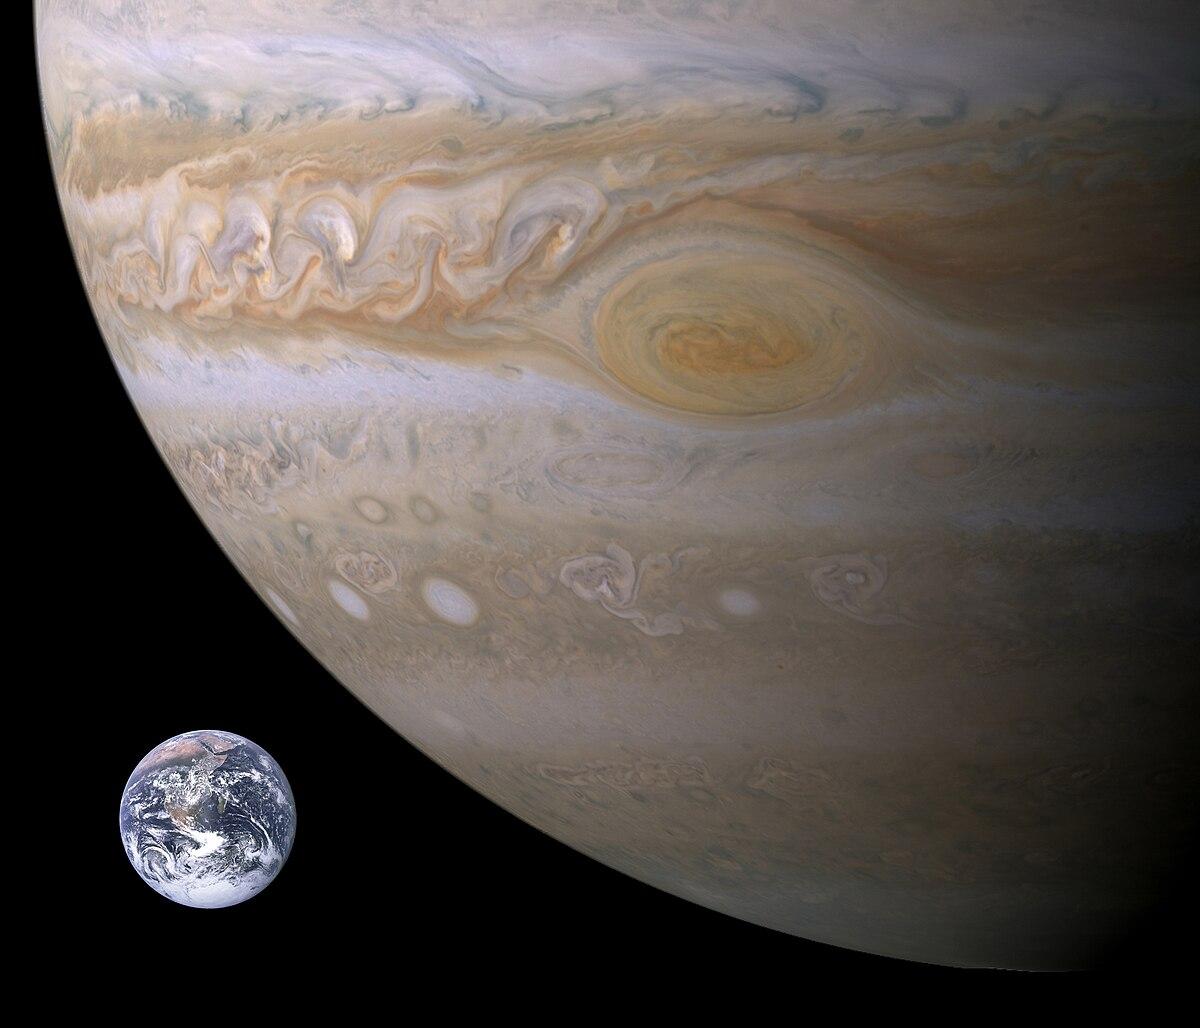 Trigon The sun is Jupiter. What value